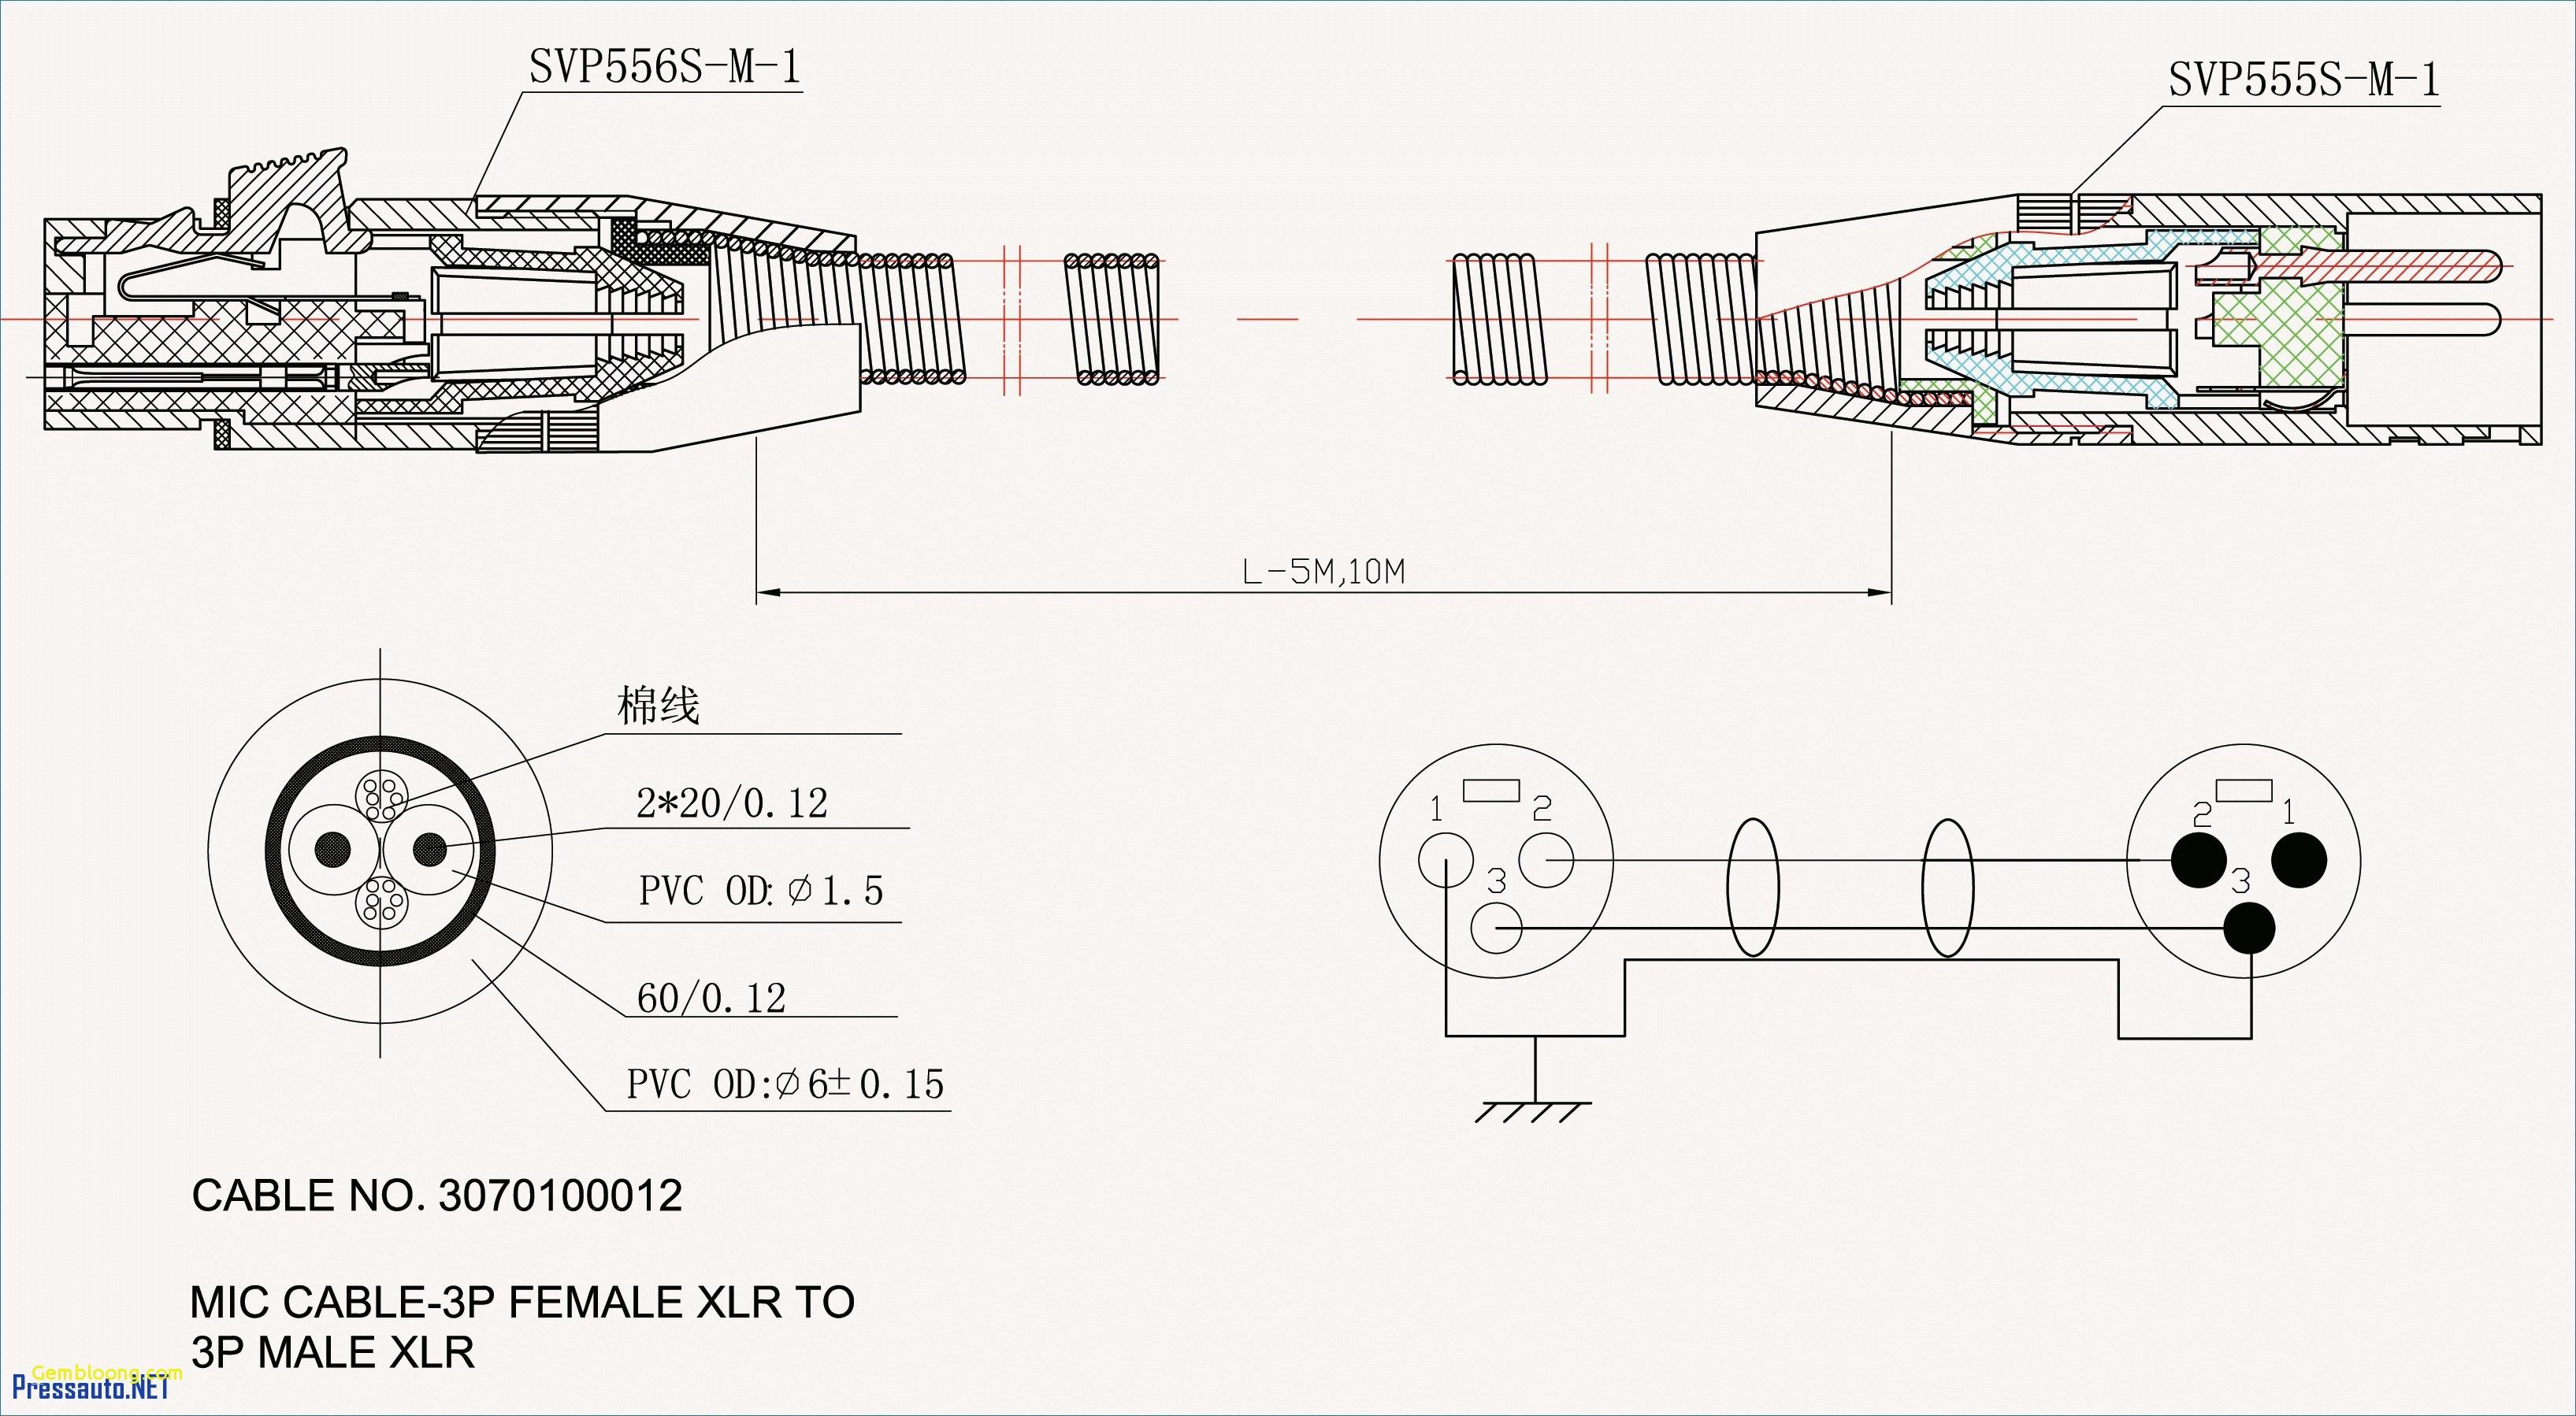 Ford Fiesta Engine Diagram Free Bmw E36 Dme Wiring Diagram E36 Wiring Diagram – Wiring Diagram Of Ford Fiesta Engine Diagram